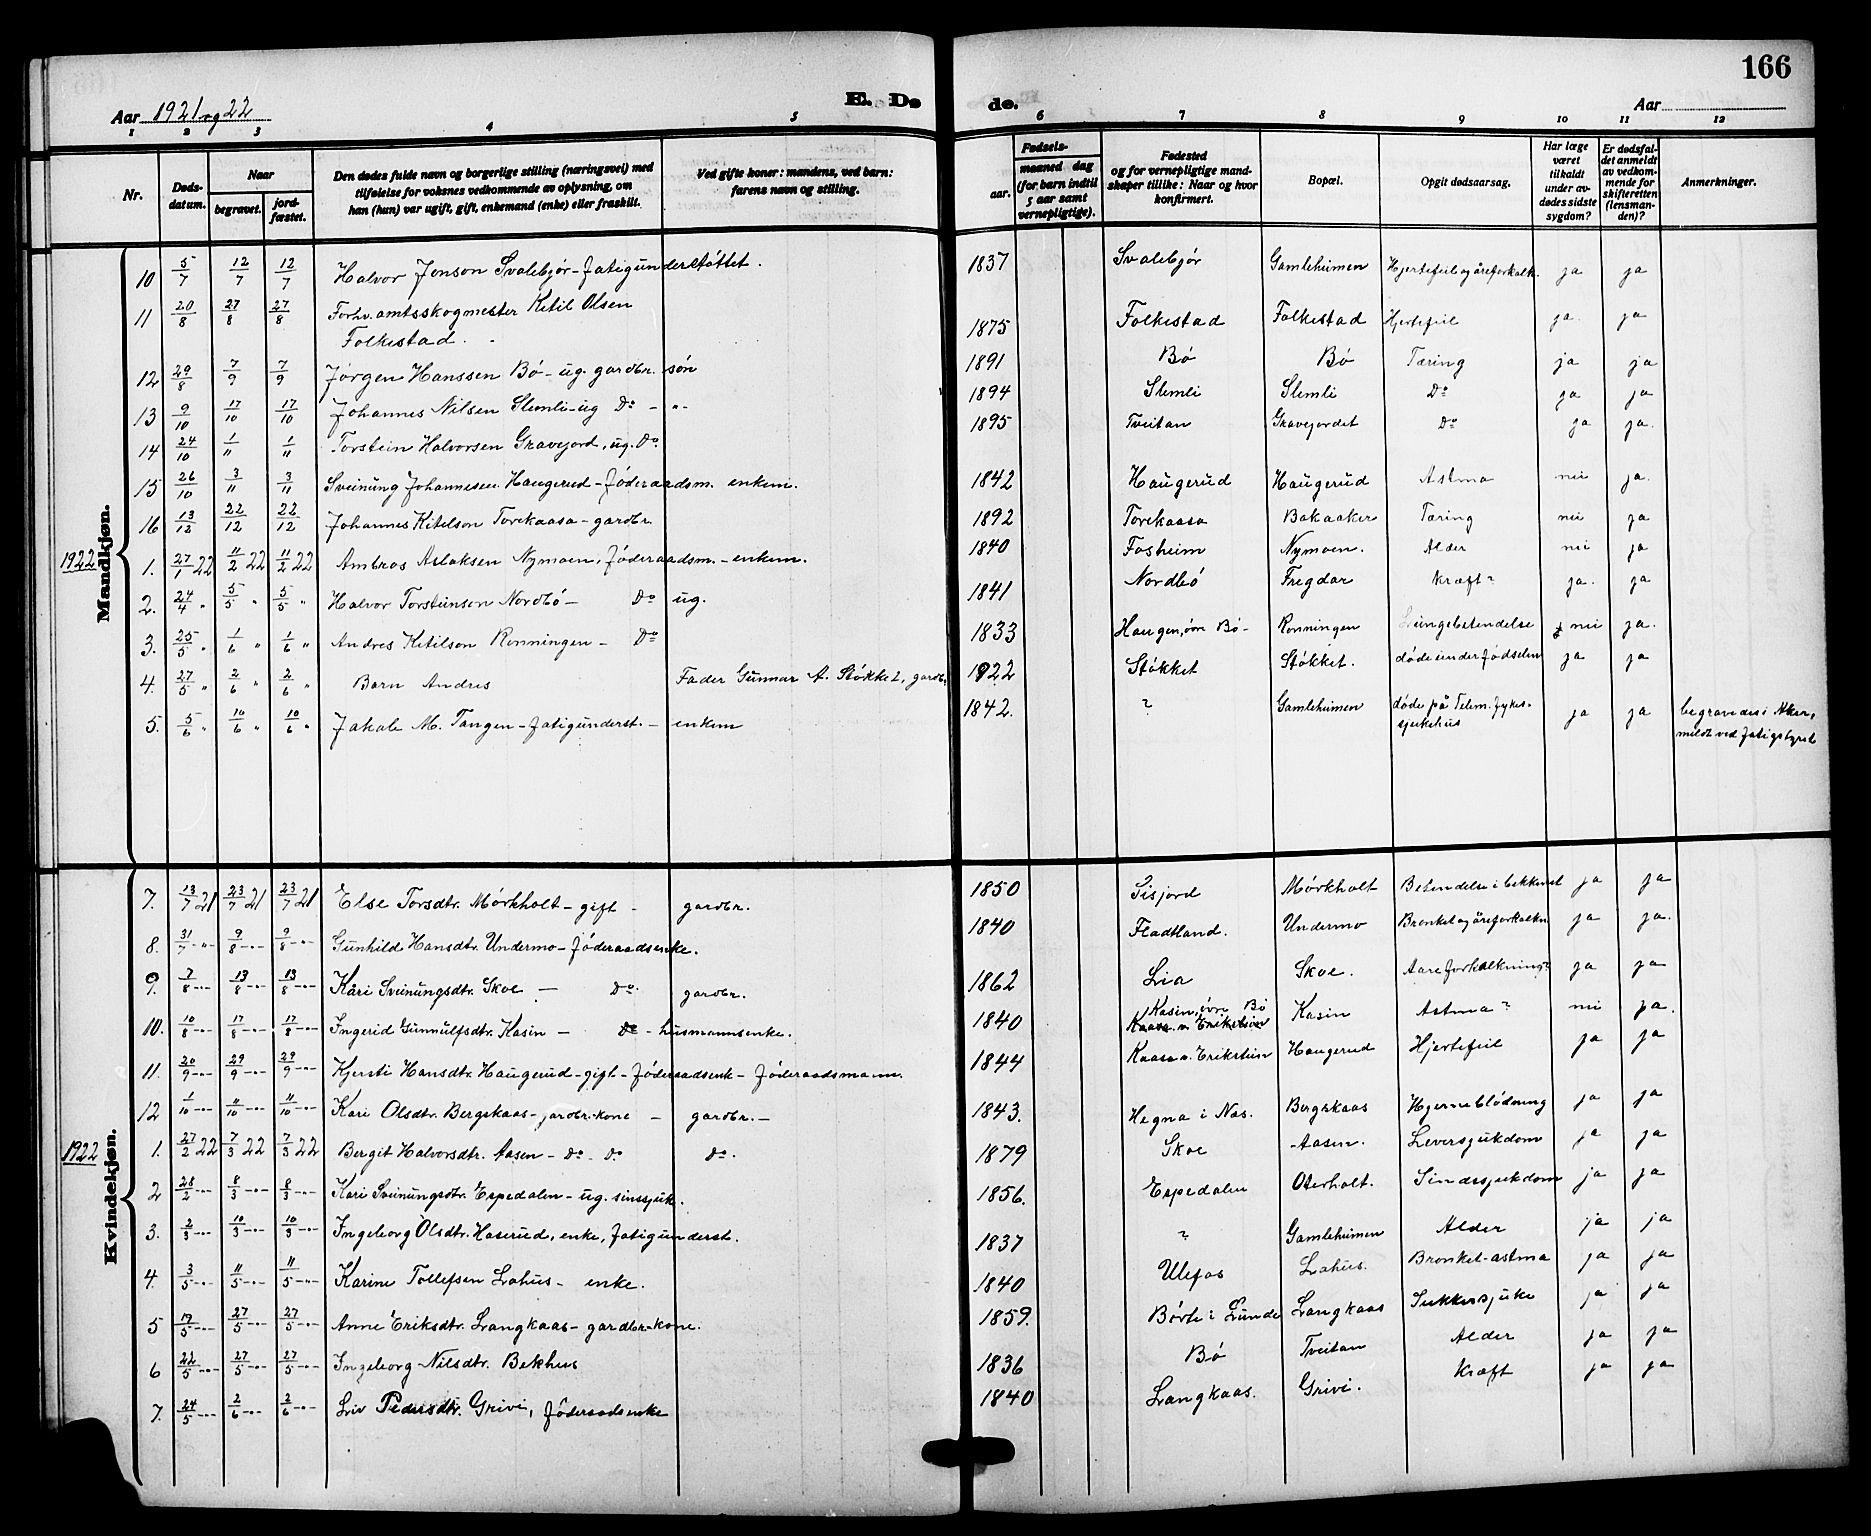 SAKO, Bø kirkebøker, G/Ga/L0007: Klokkerbok nr. 7, 1909-1924, s. 166